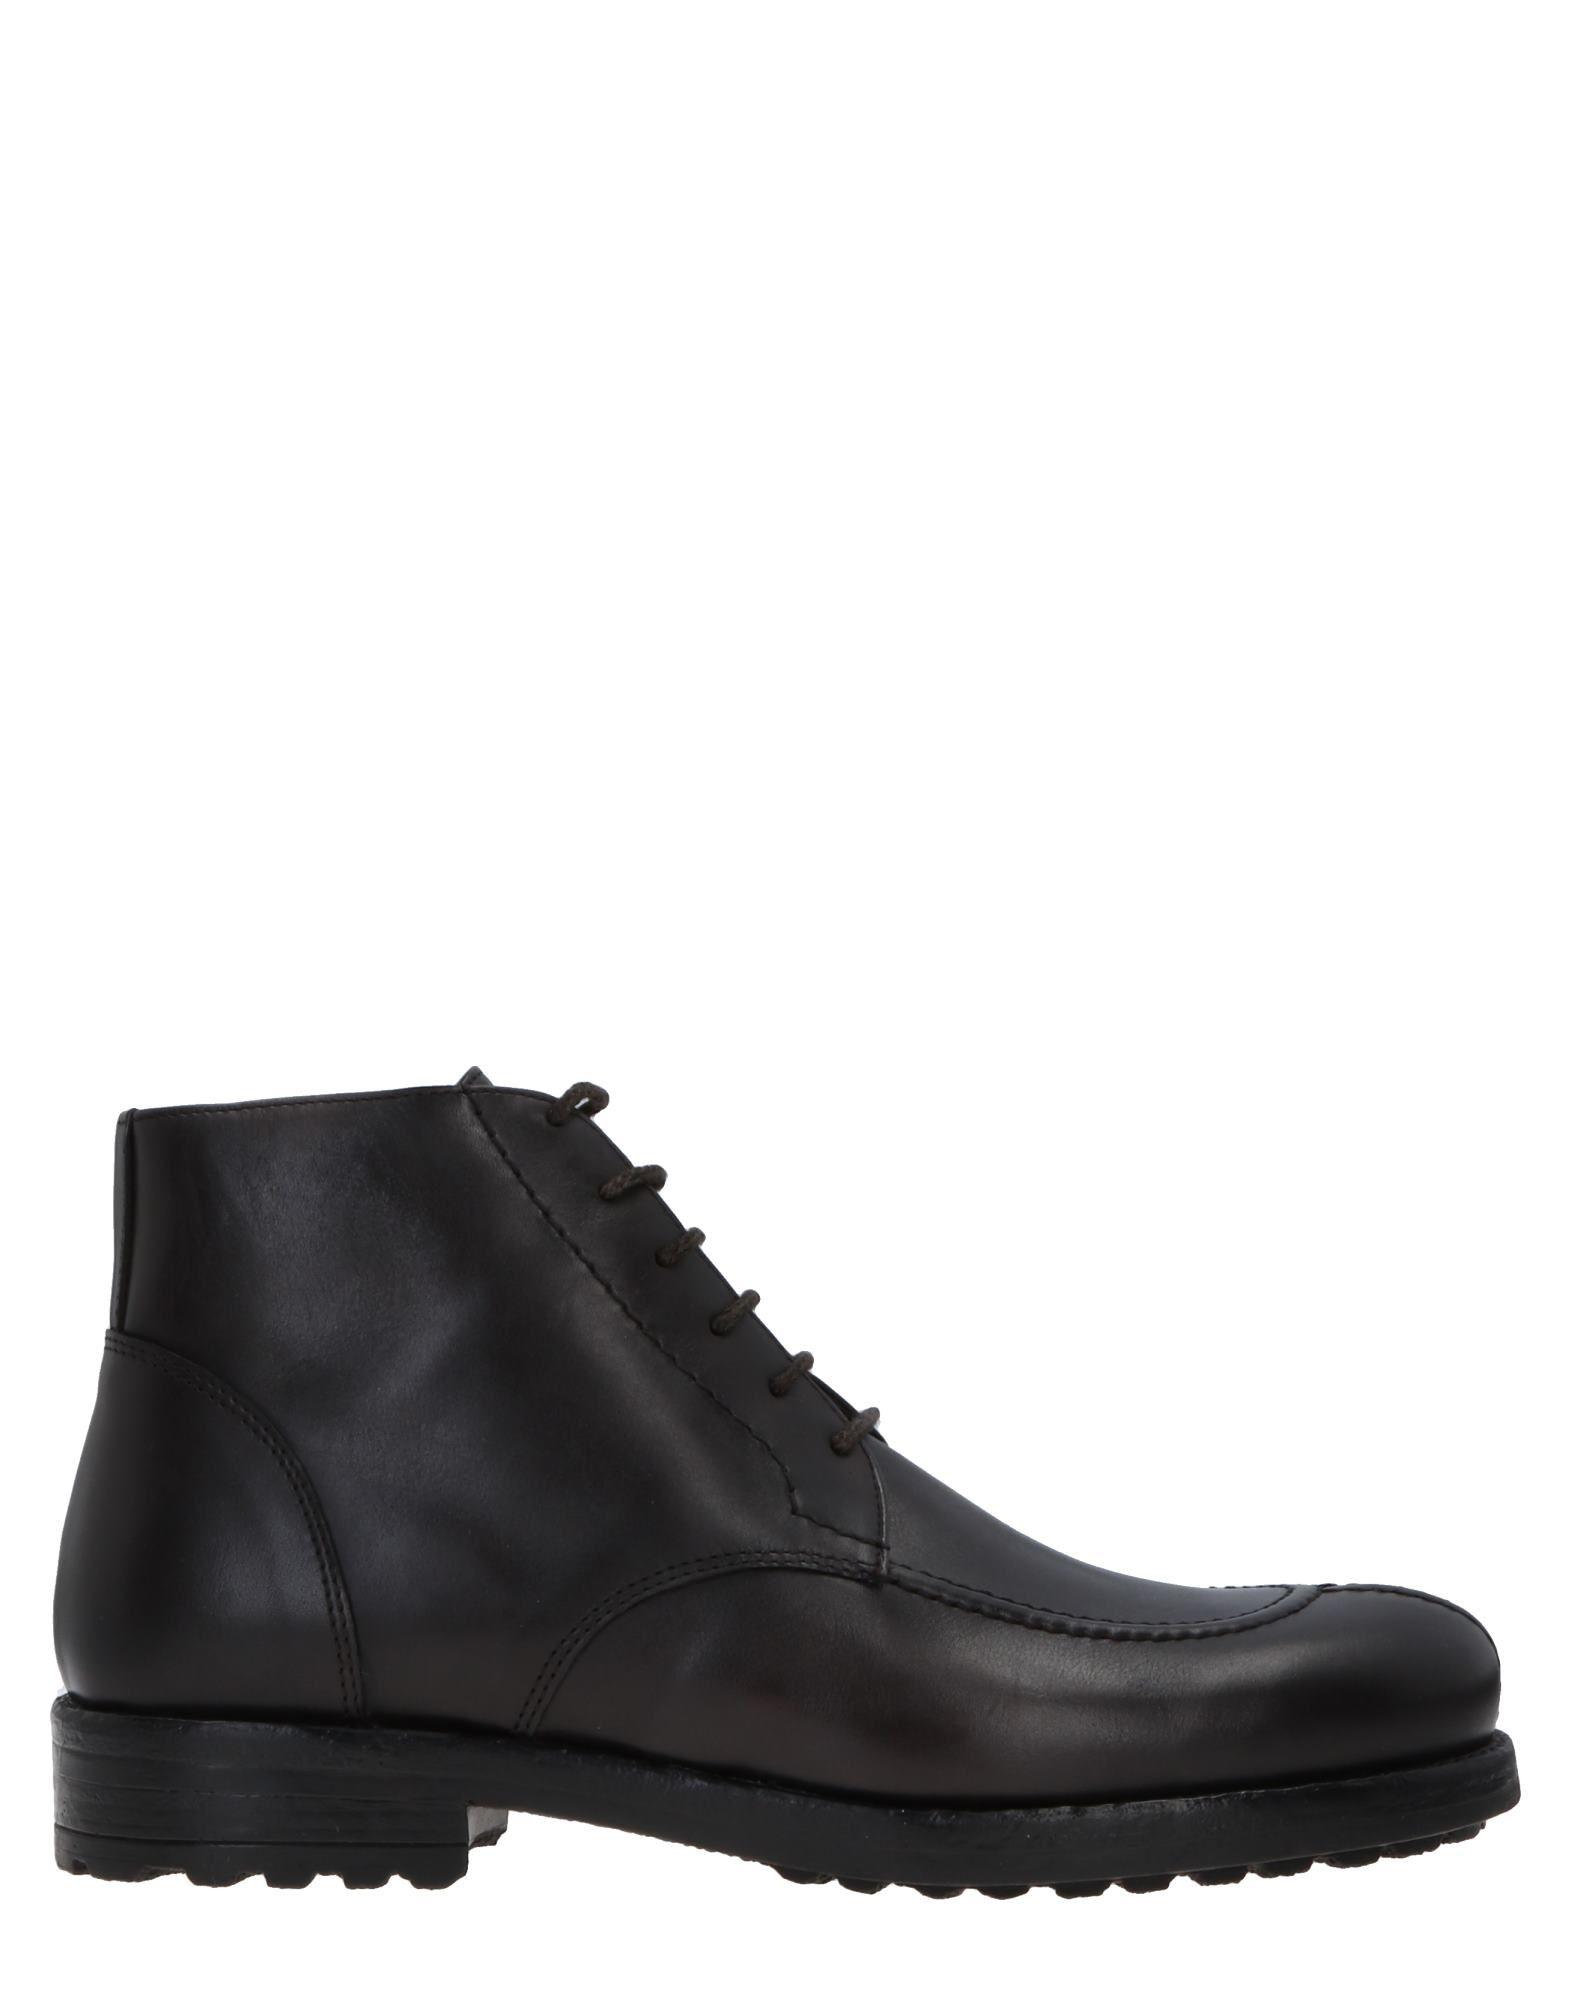 ROBERTO BOTTICELLI Boots in Dark Brown